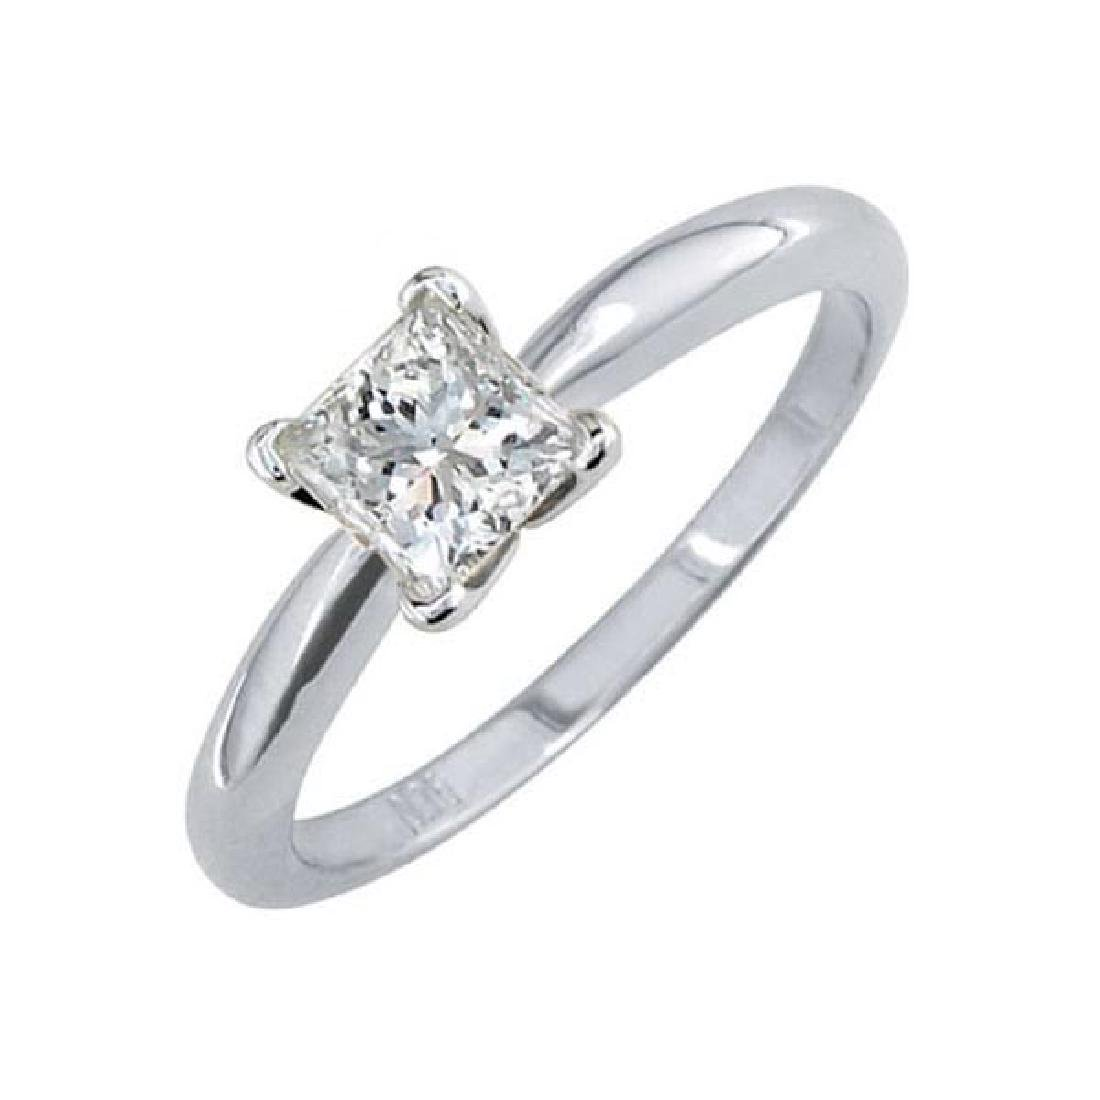 Certified 1.13 CTW Princess Diamond Solitaire 14k Ring